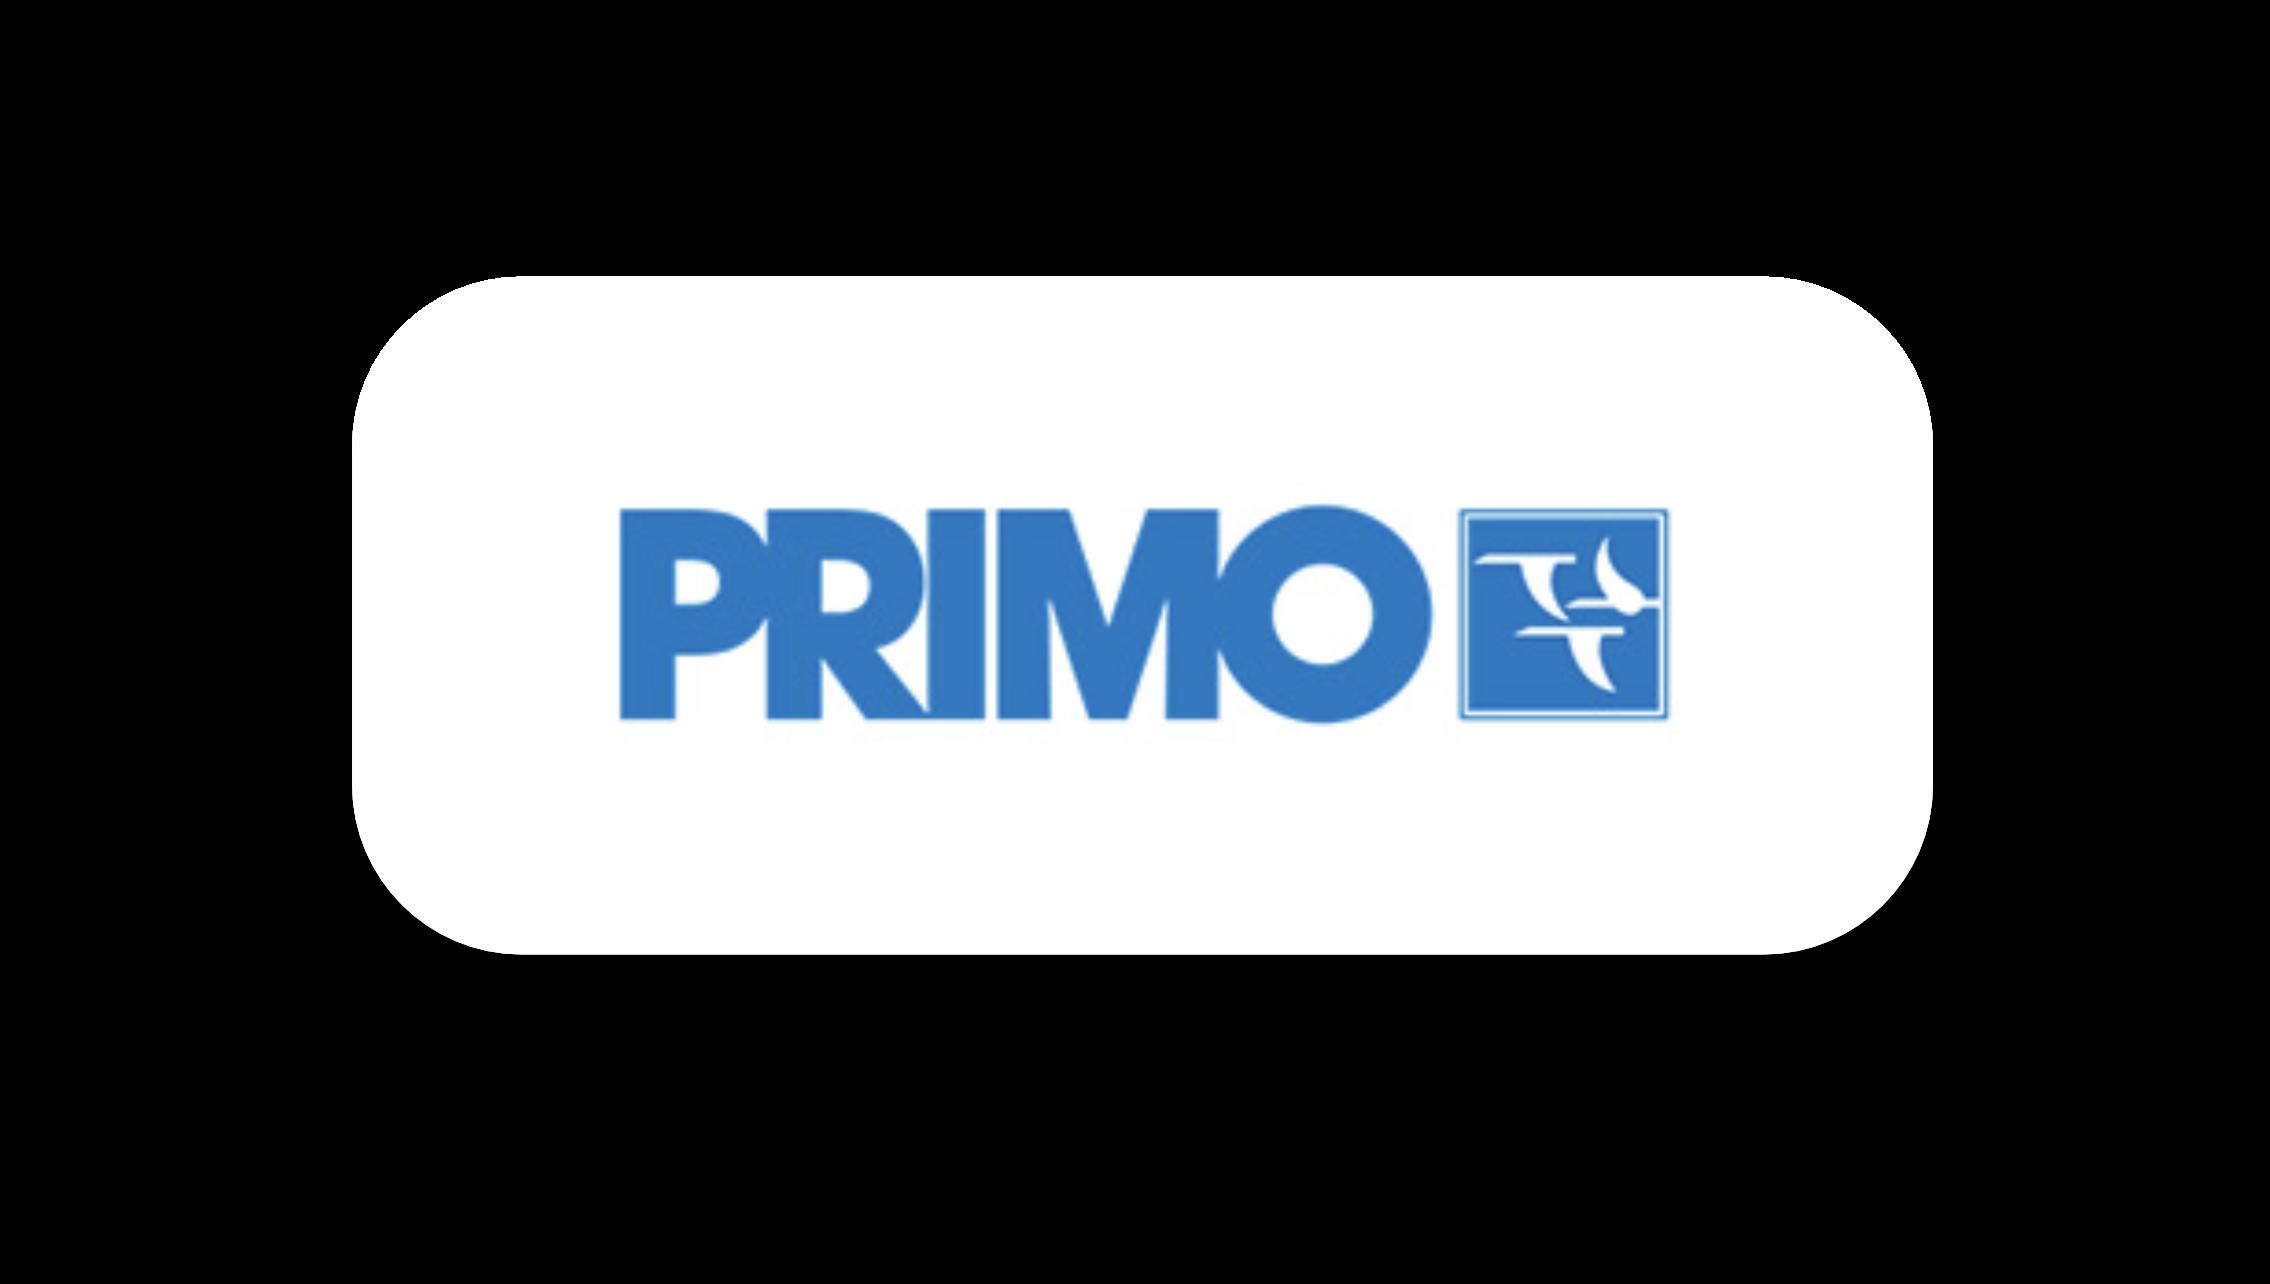 primo logo shadow